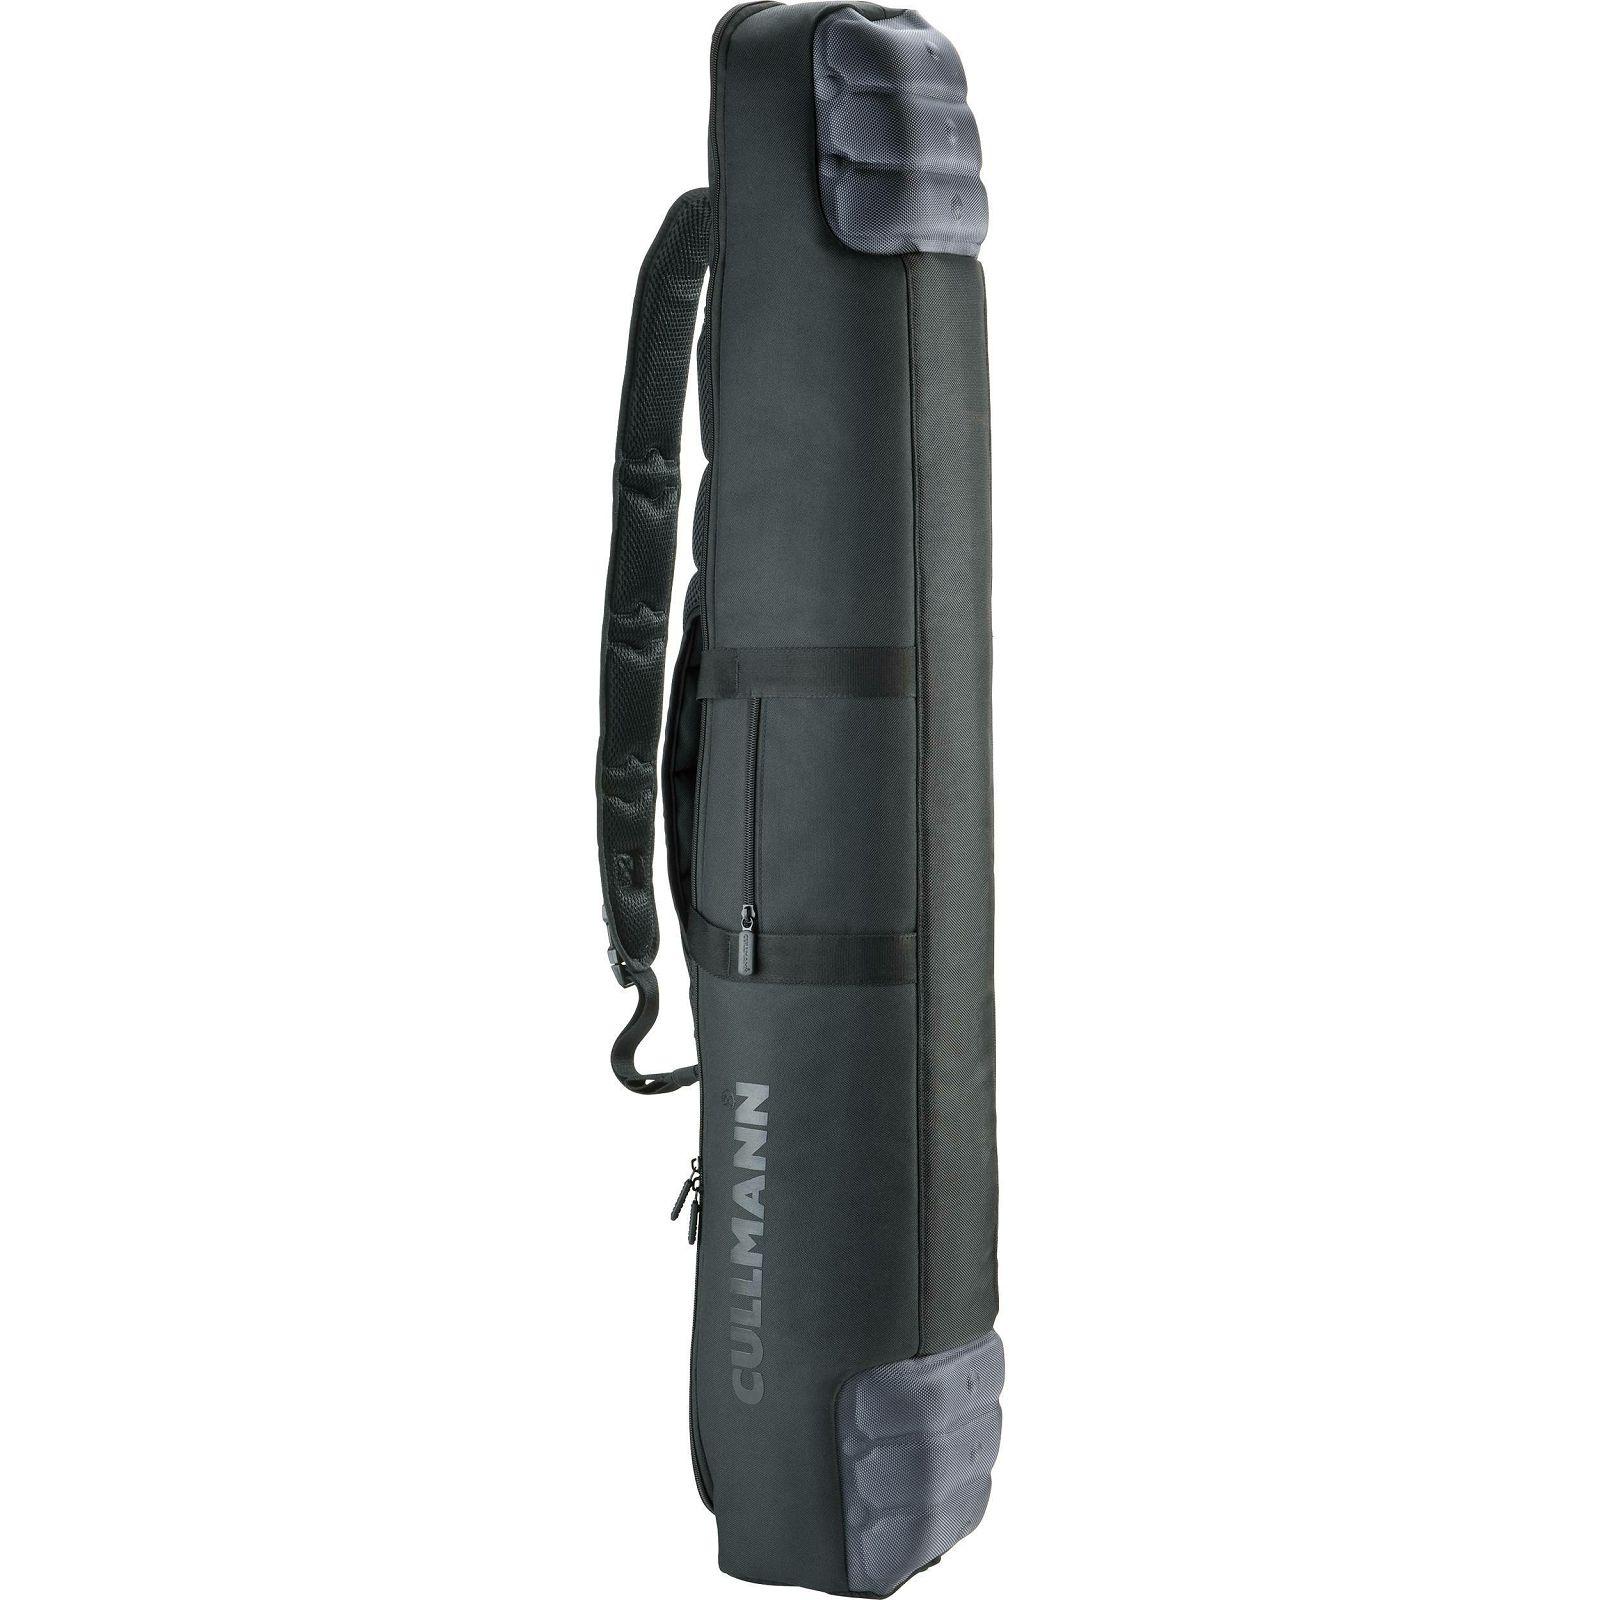 Cullmann Protector PodBag 600 Tripod bag torba za stativ (55497)